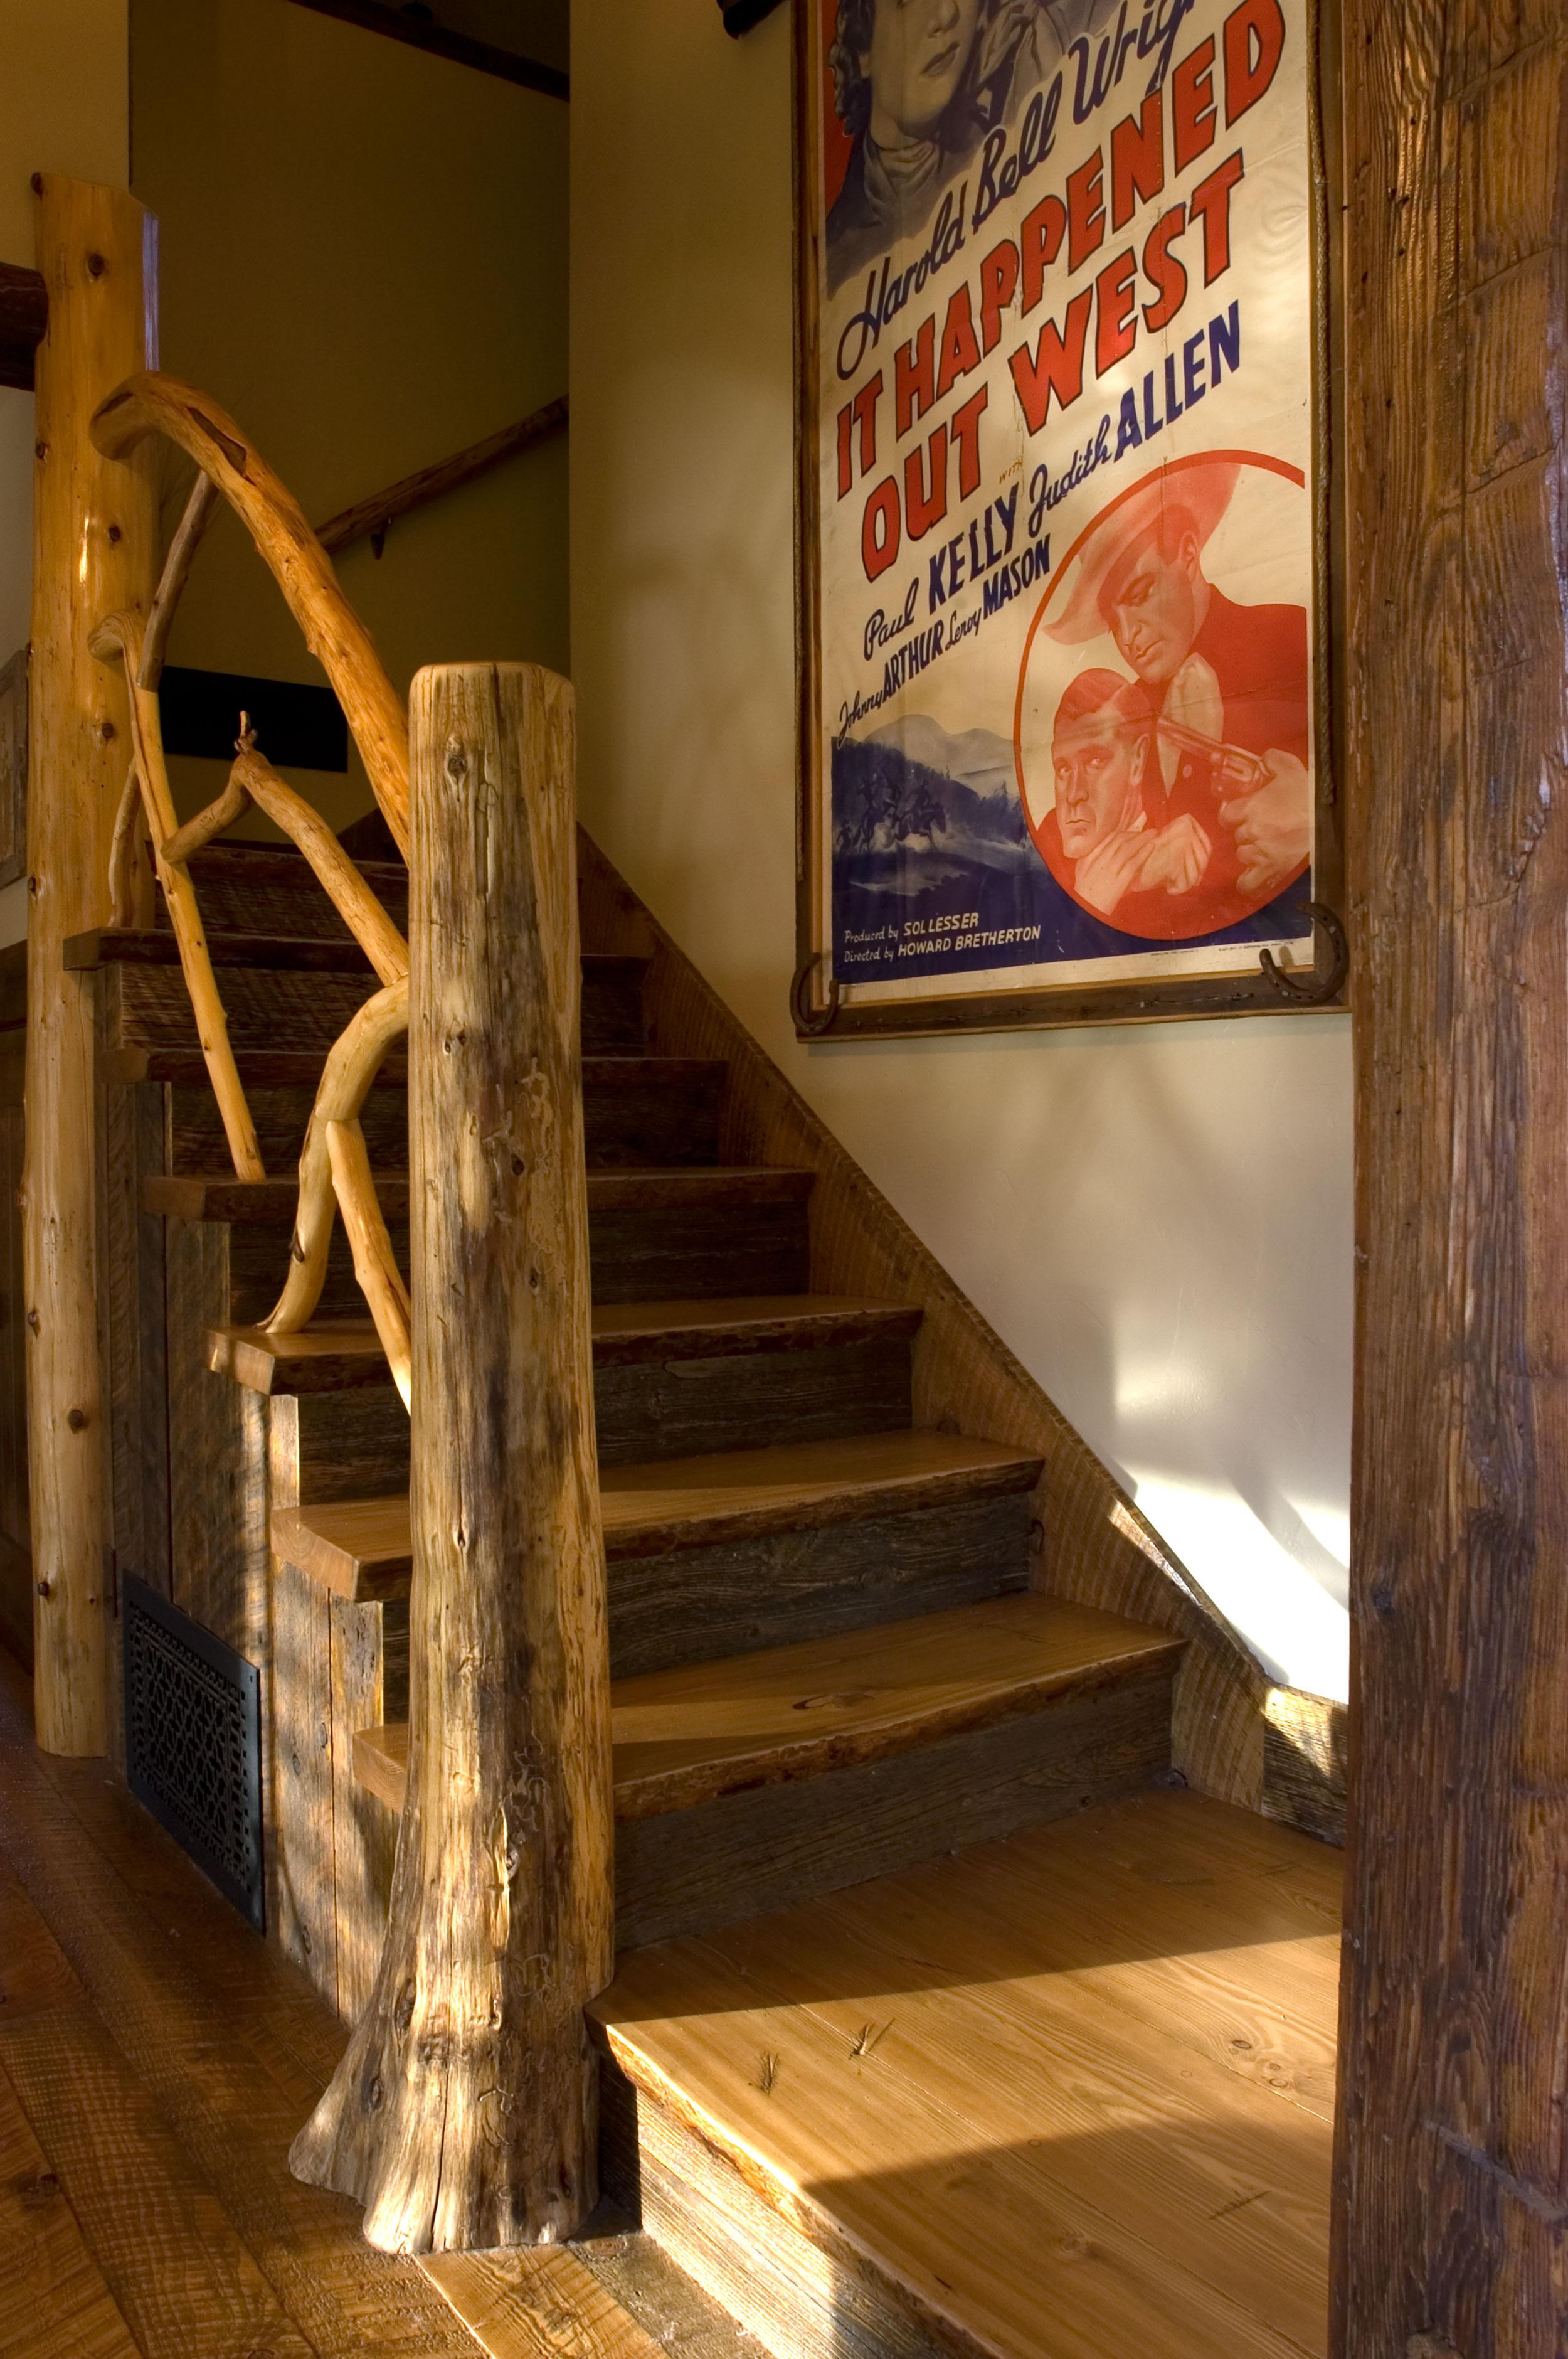 Cruz_stair3.jpg